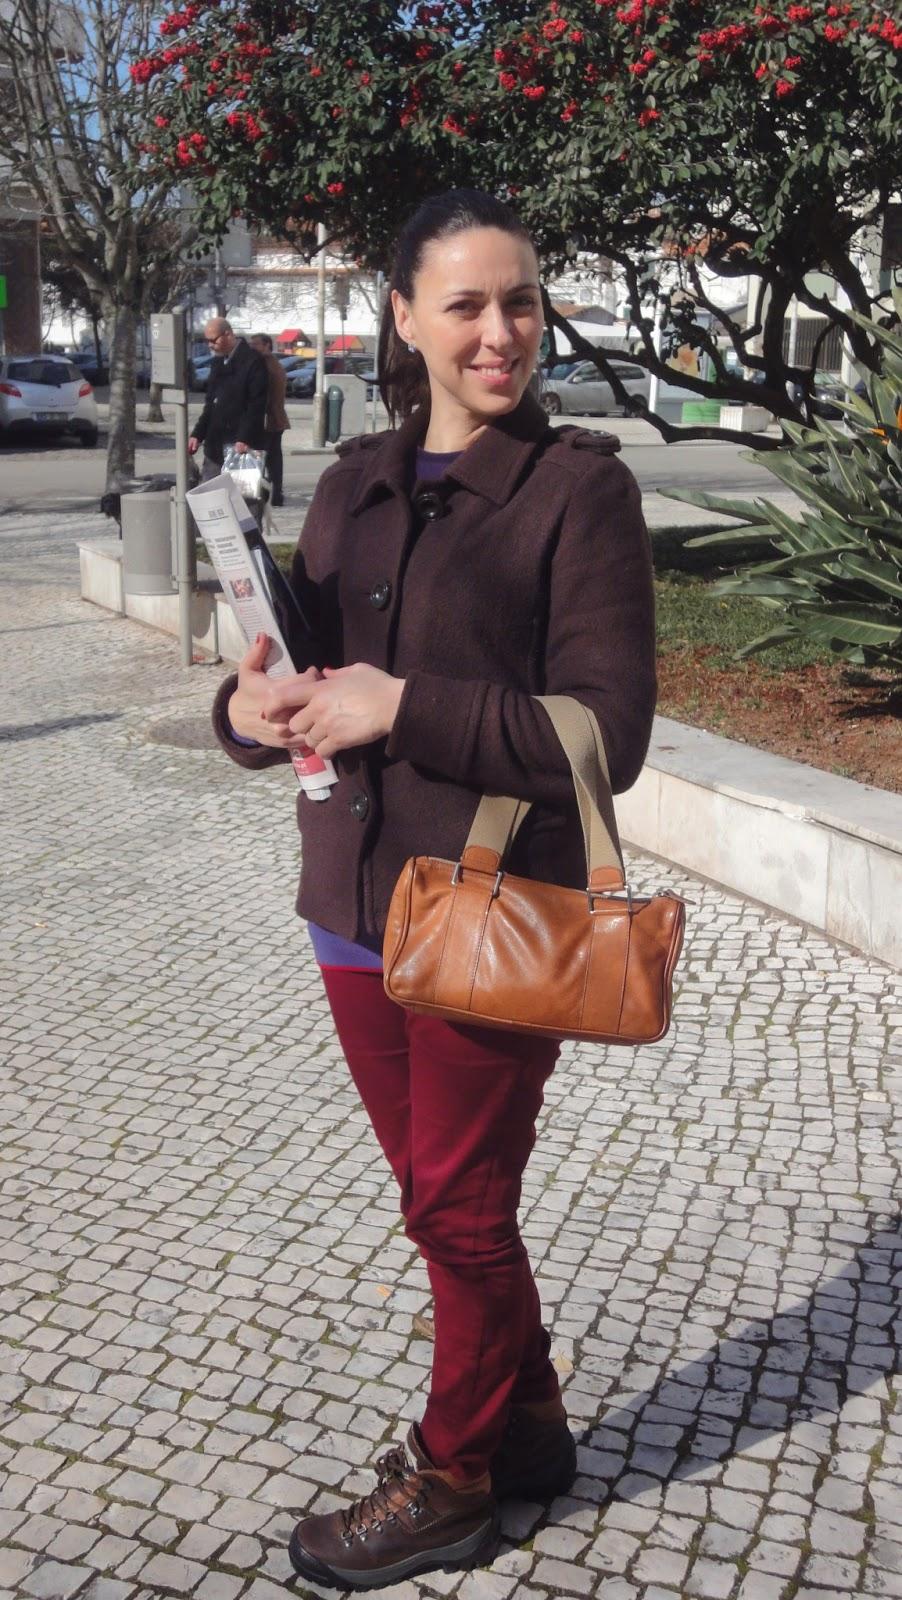 http://modanosapatinho.blogspot.pt/